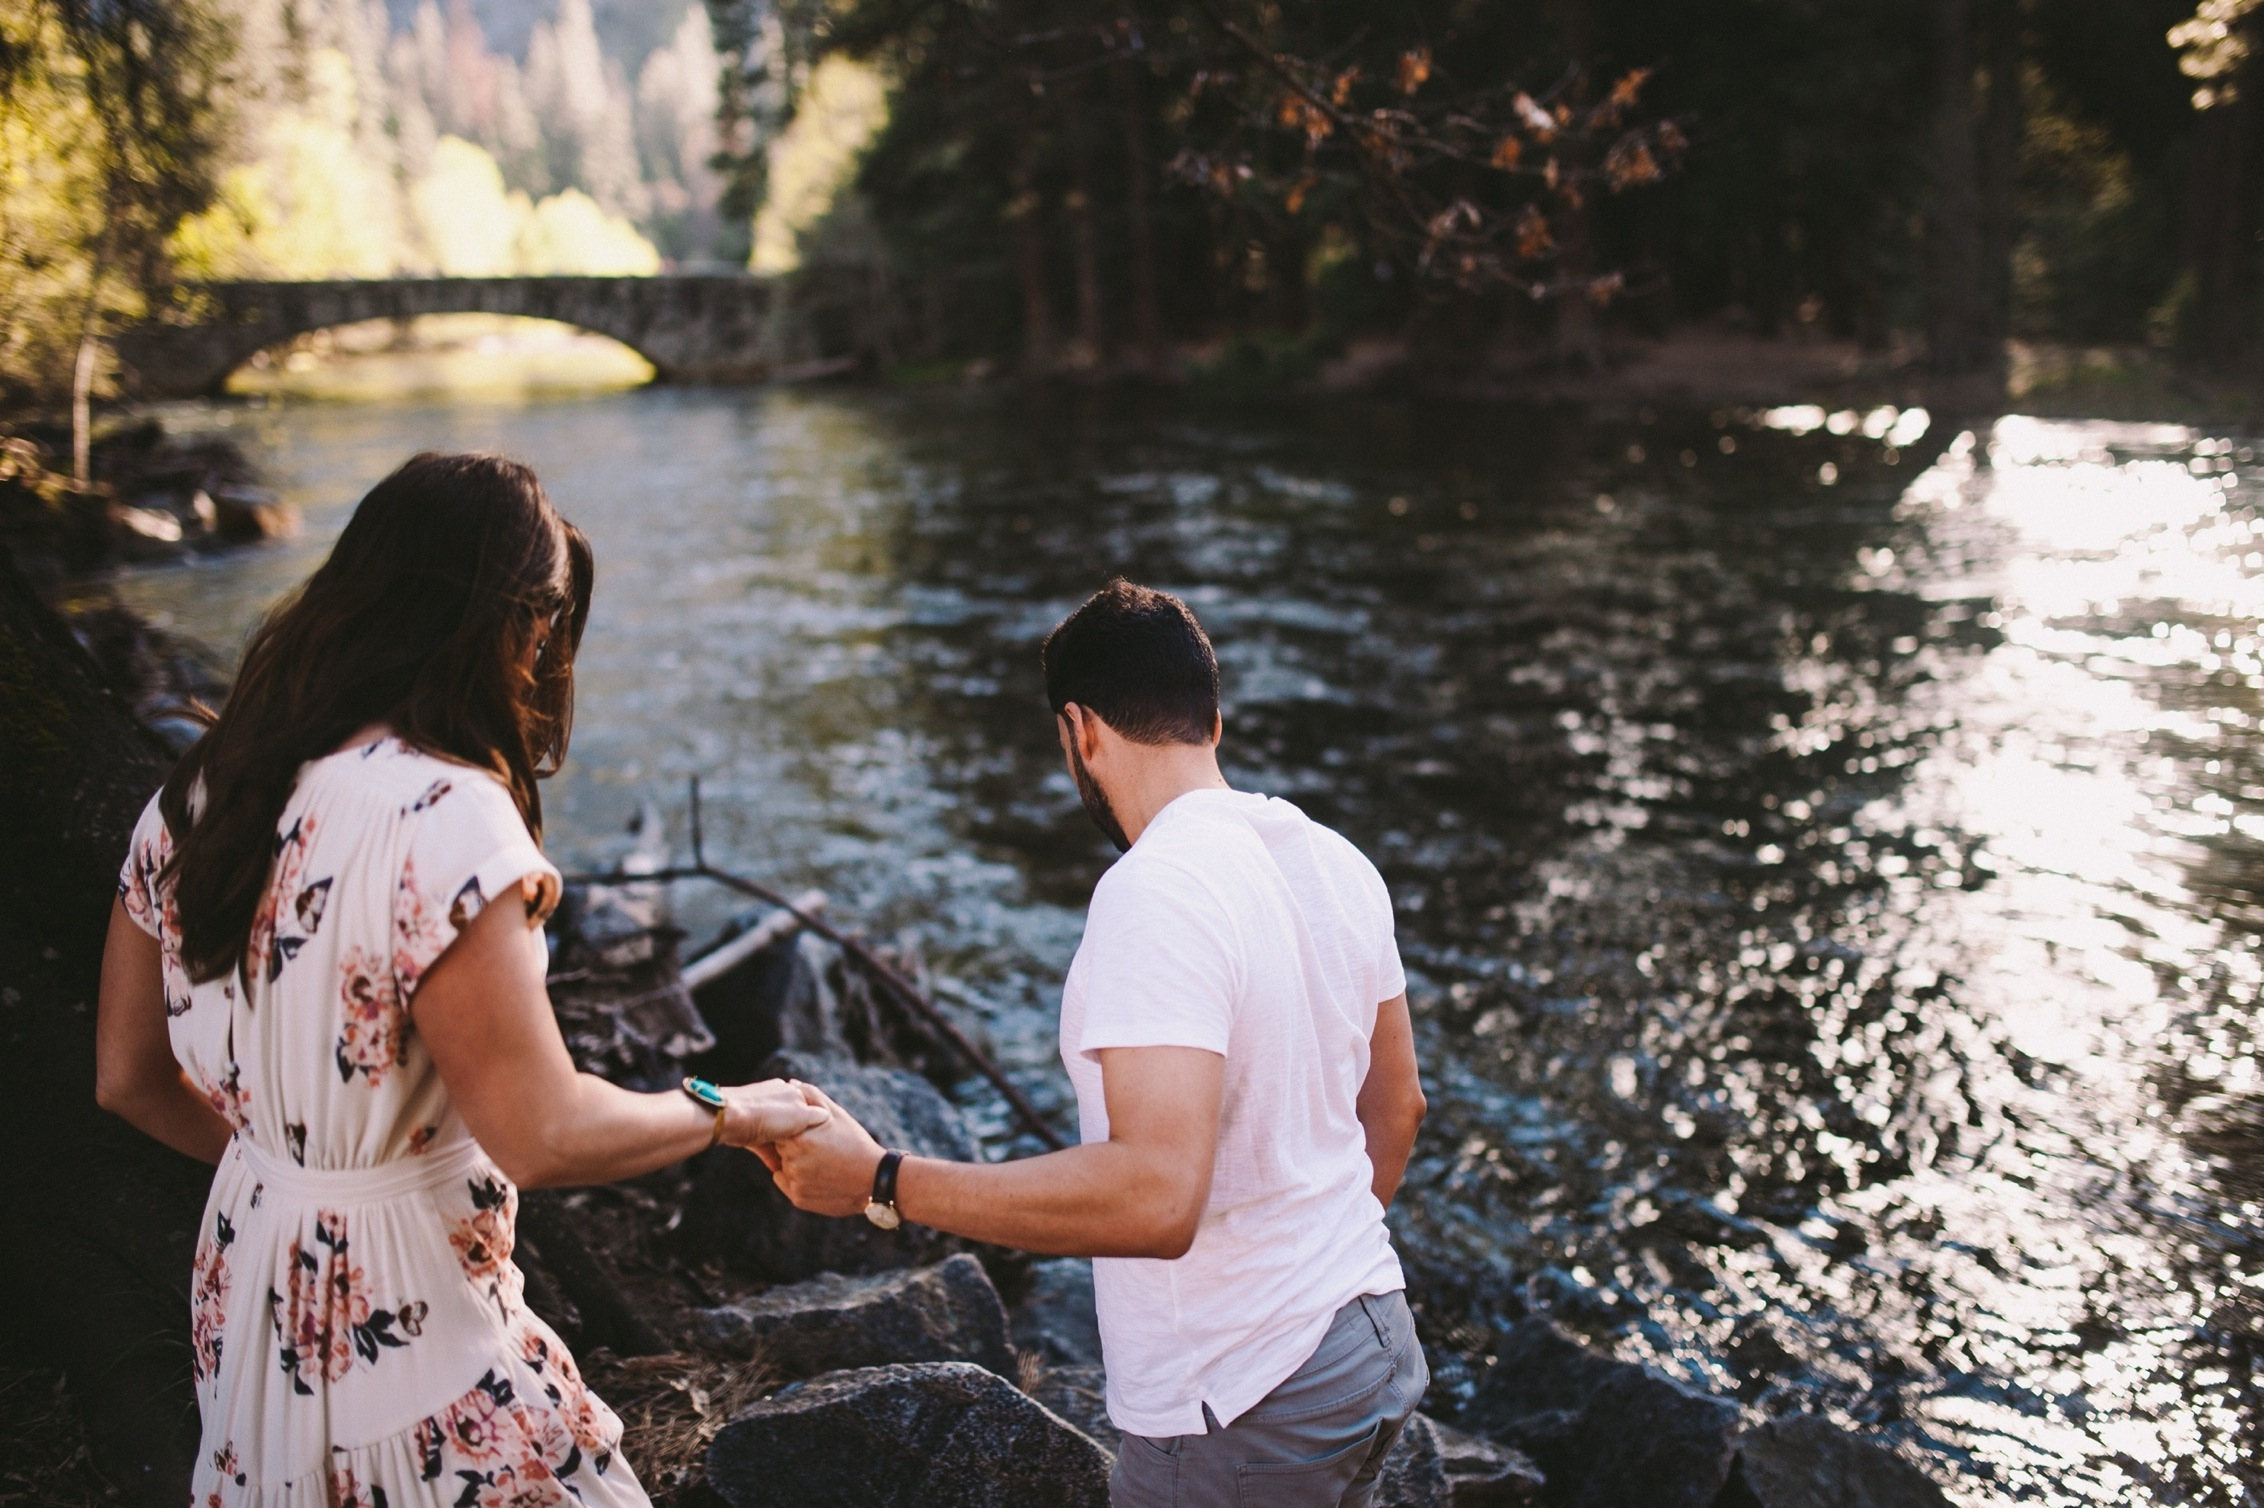 Stoneman Bridge Engagement Shoot in Yosemite